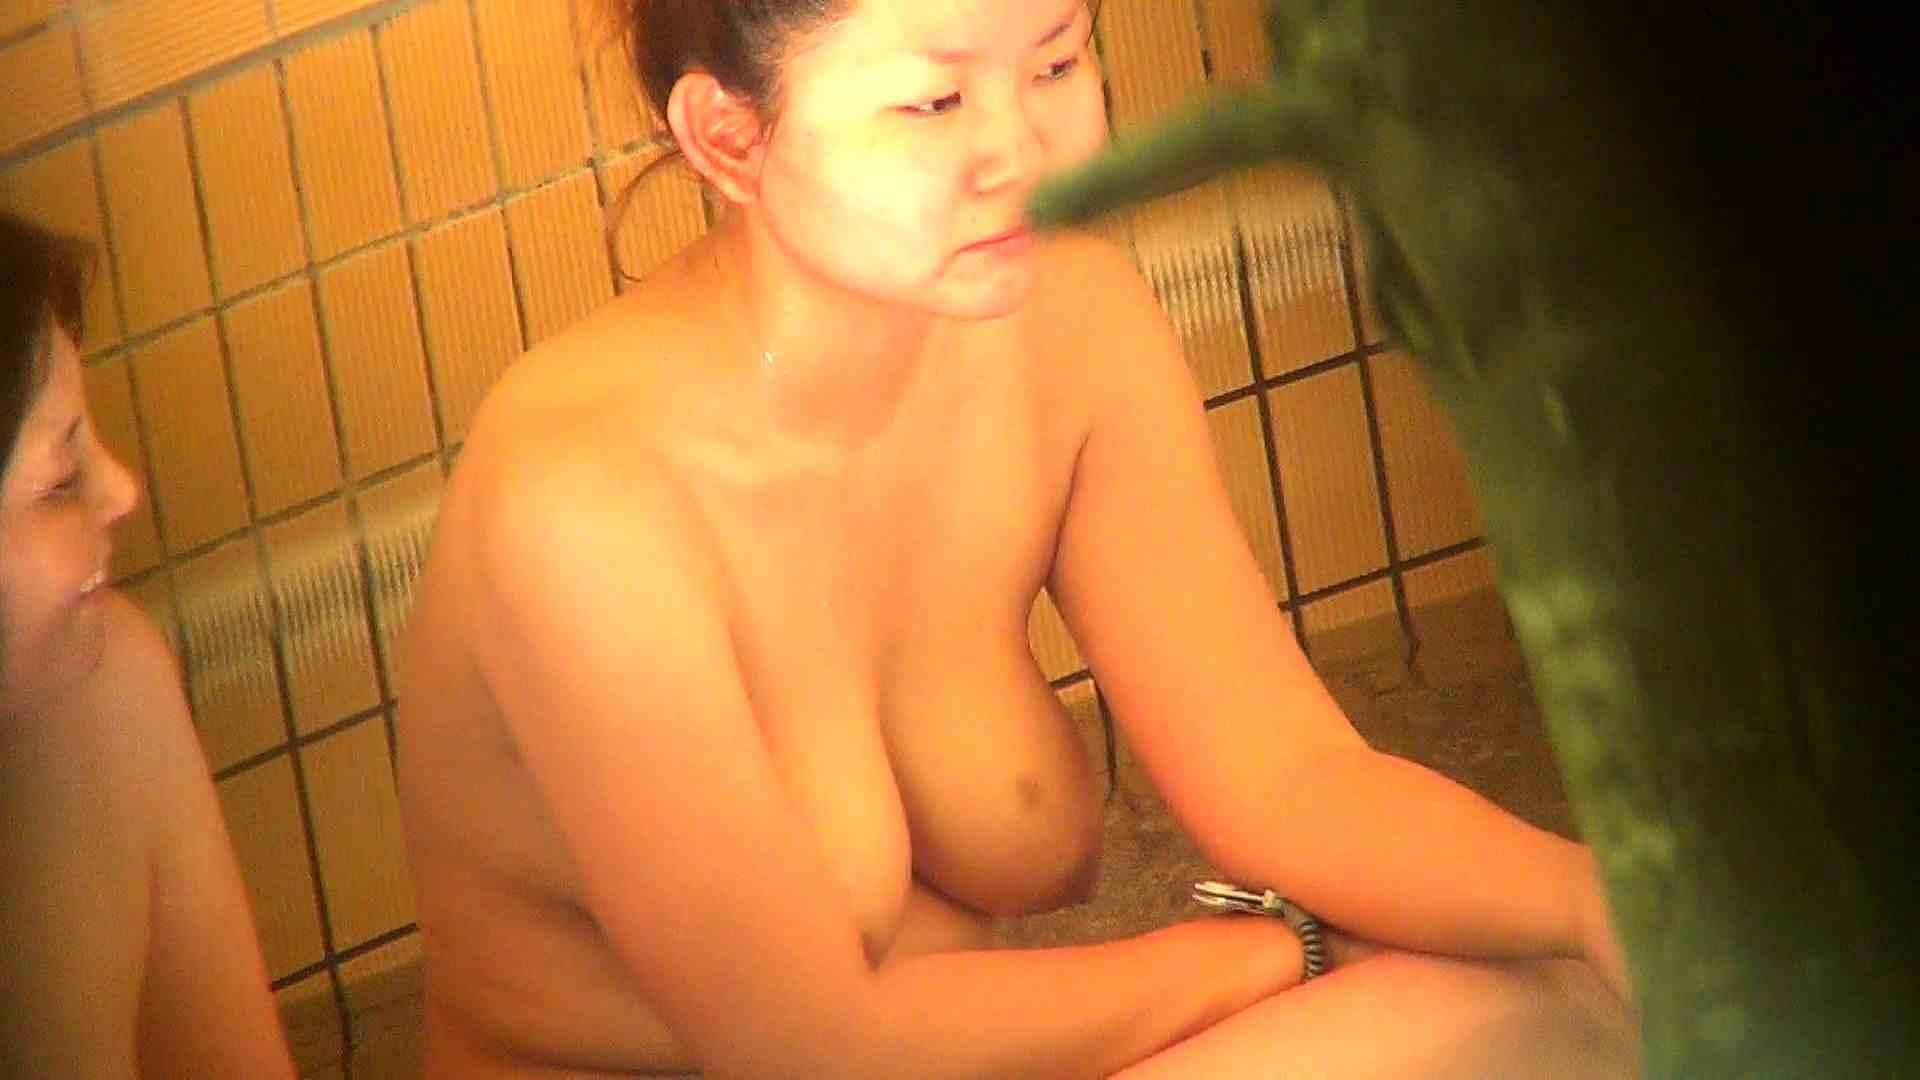 Vol.37 オデブと妊婦とokaasann 美女 オマンコ無修正動画無料 94枚 63